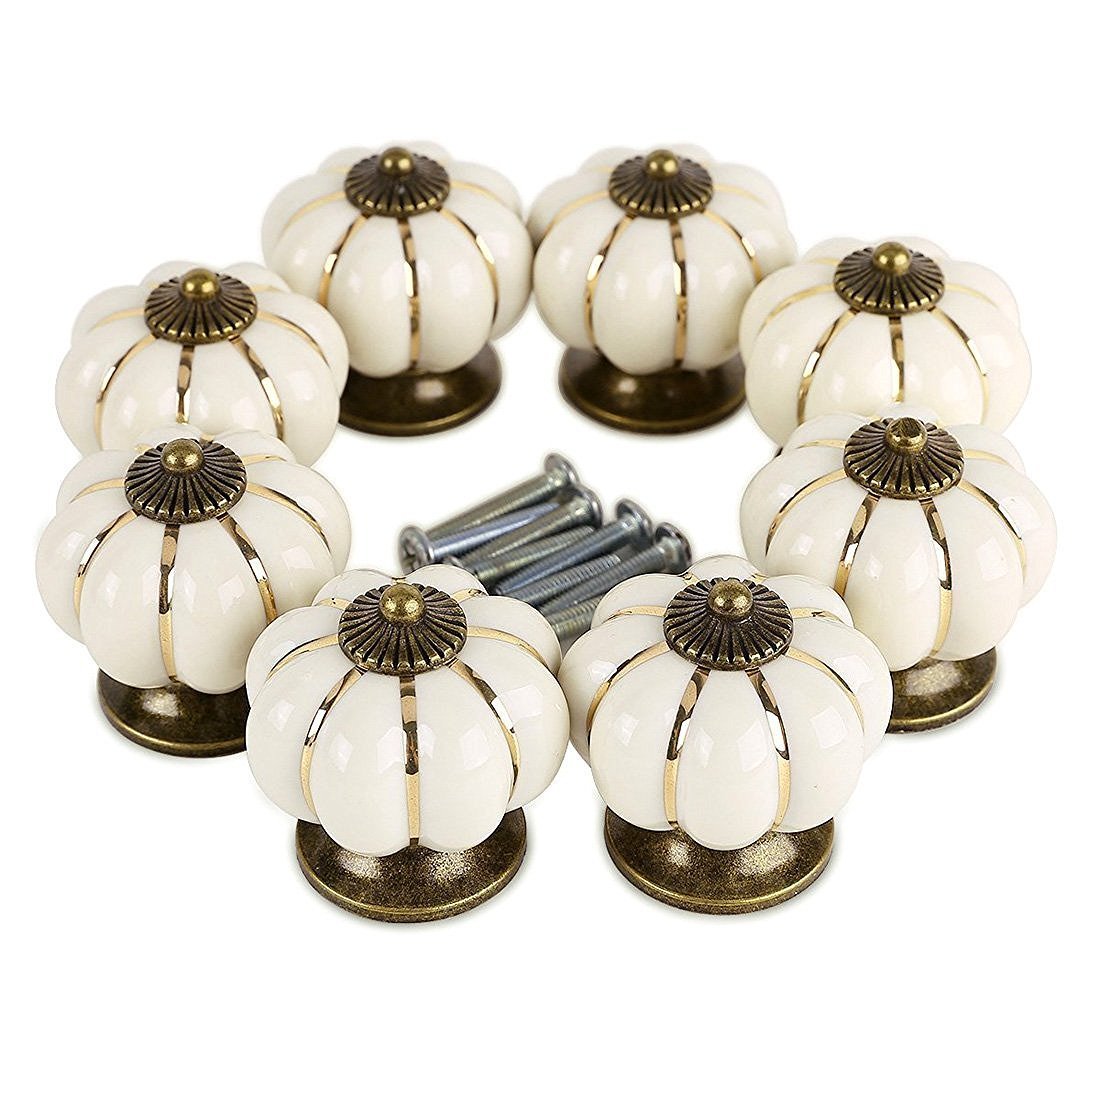 Pumpkin Ceramic Drawer Knobs, YIFAN Set of 10 Cabinet Pulls Dresser Cupboard Door Handles - White 0